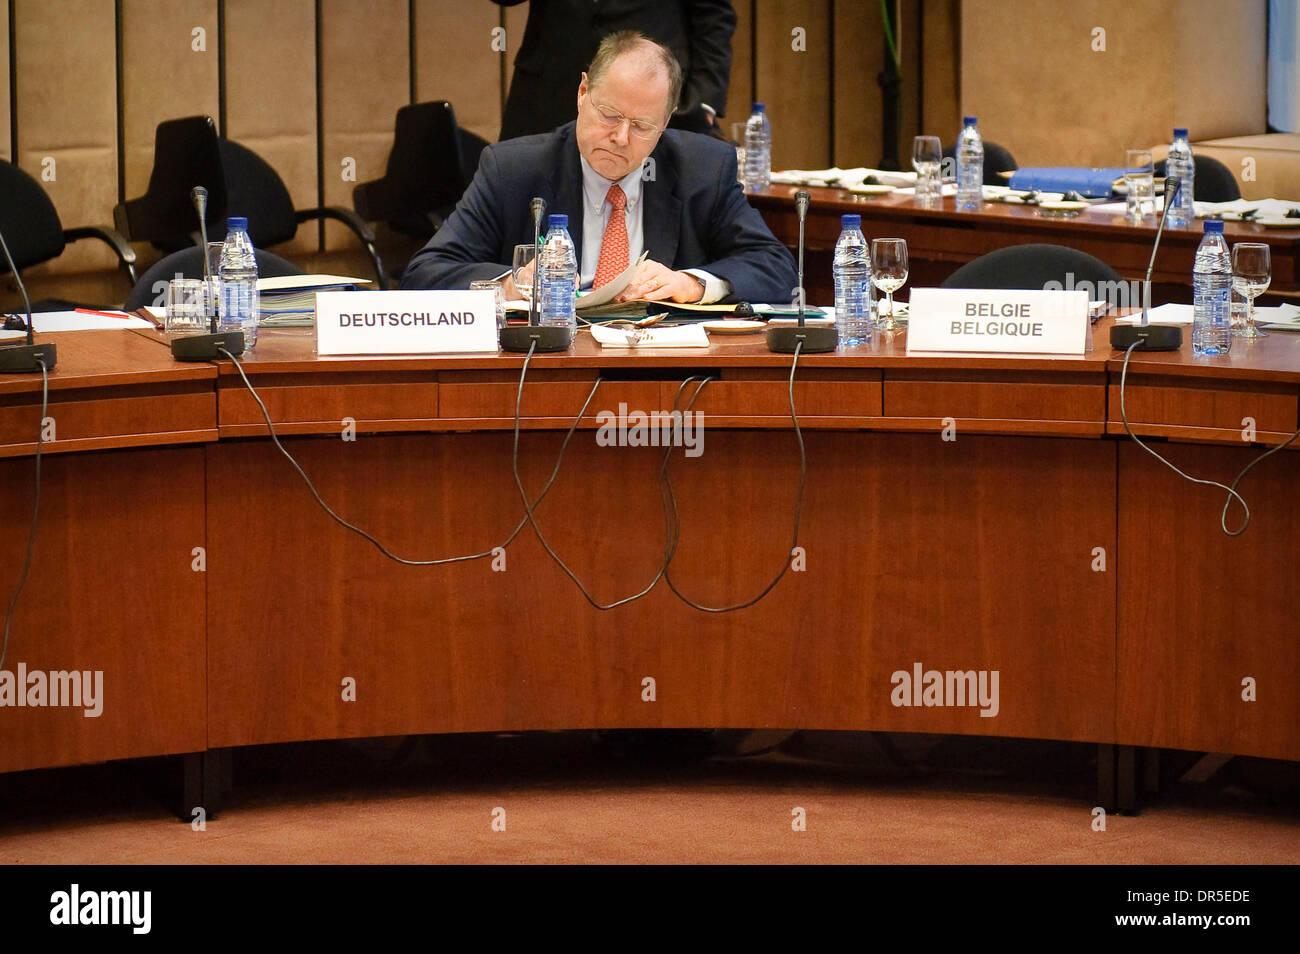 Mar 09, 2009 - Brussels, Belgium - German Finance Minister PEER STEINBRUECK at the start of an Eurogroup Finance ministers meeting at the European council headquarters. (Credit Image: © Wiktor Dabkowski/ZUMA Press) - Stock Image